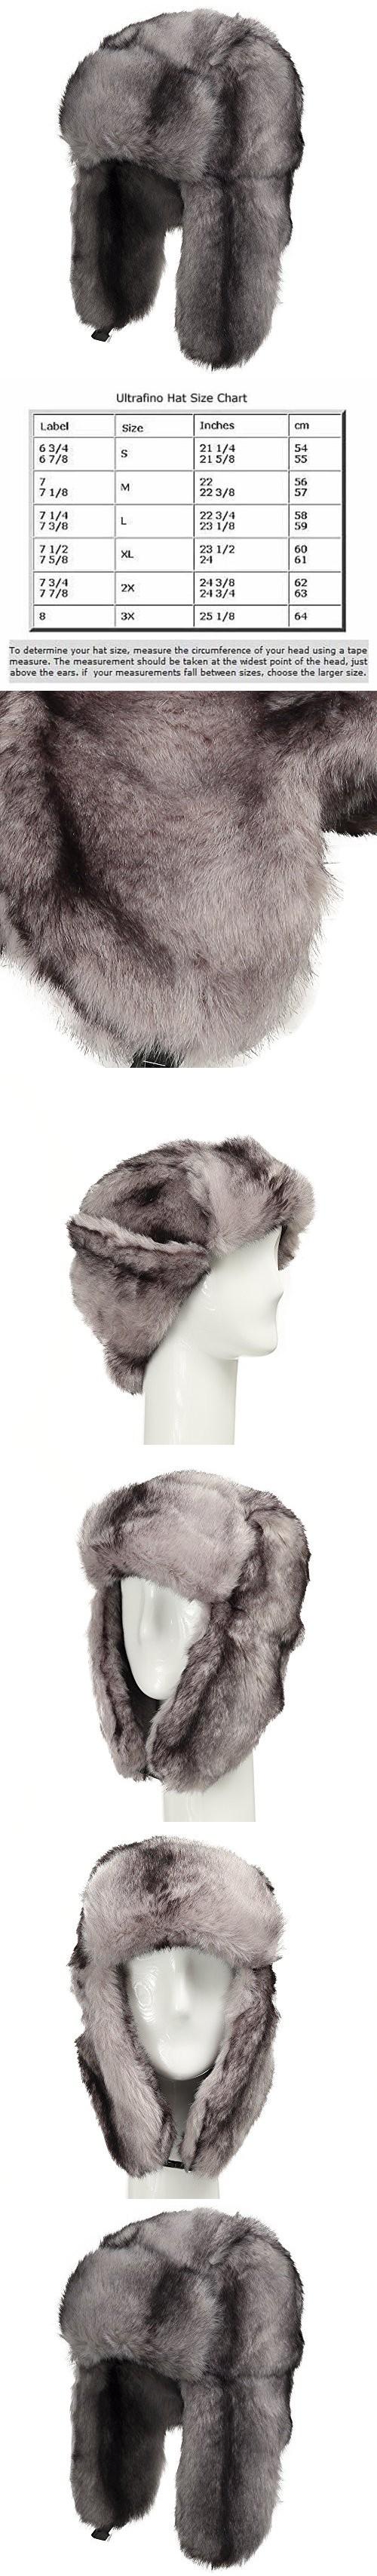 963e22fe353 Explorer Ushanka Winter Trapper Faux Fur Pilot Hat with Ear Flaps GREY 7 1 4